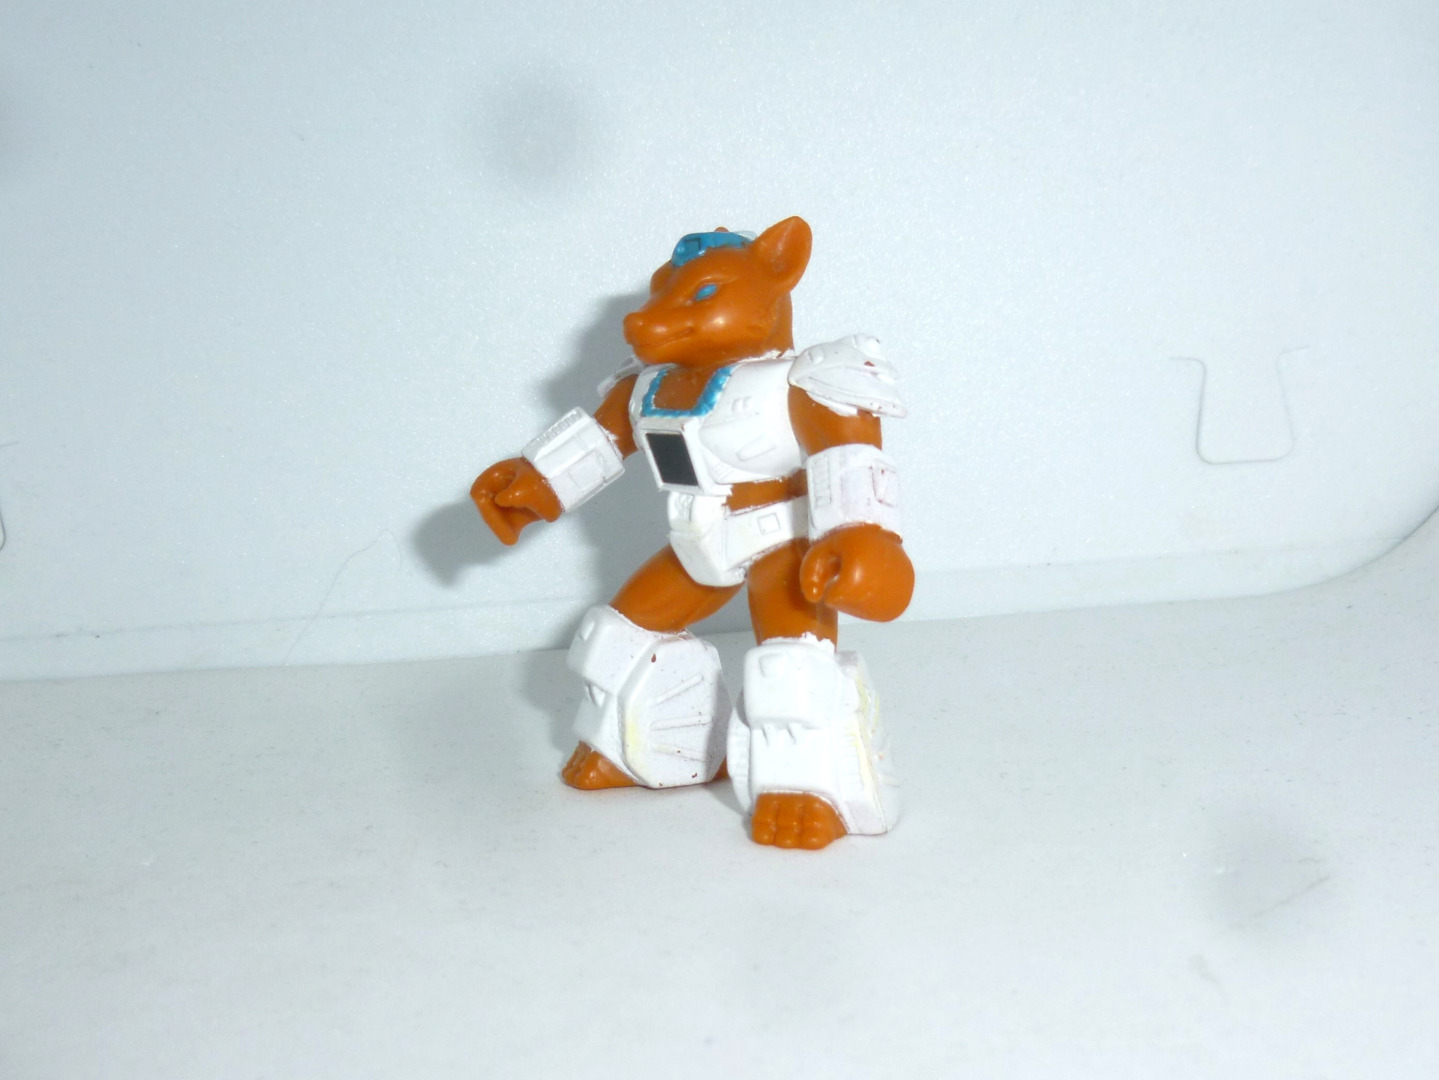 Battle Beasts Sly Fox Actionfigur Jetzt - 3